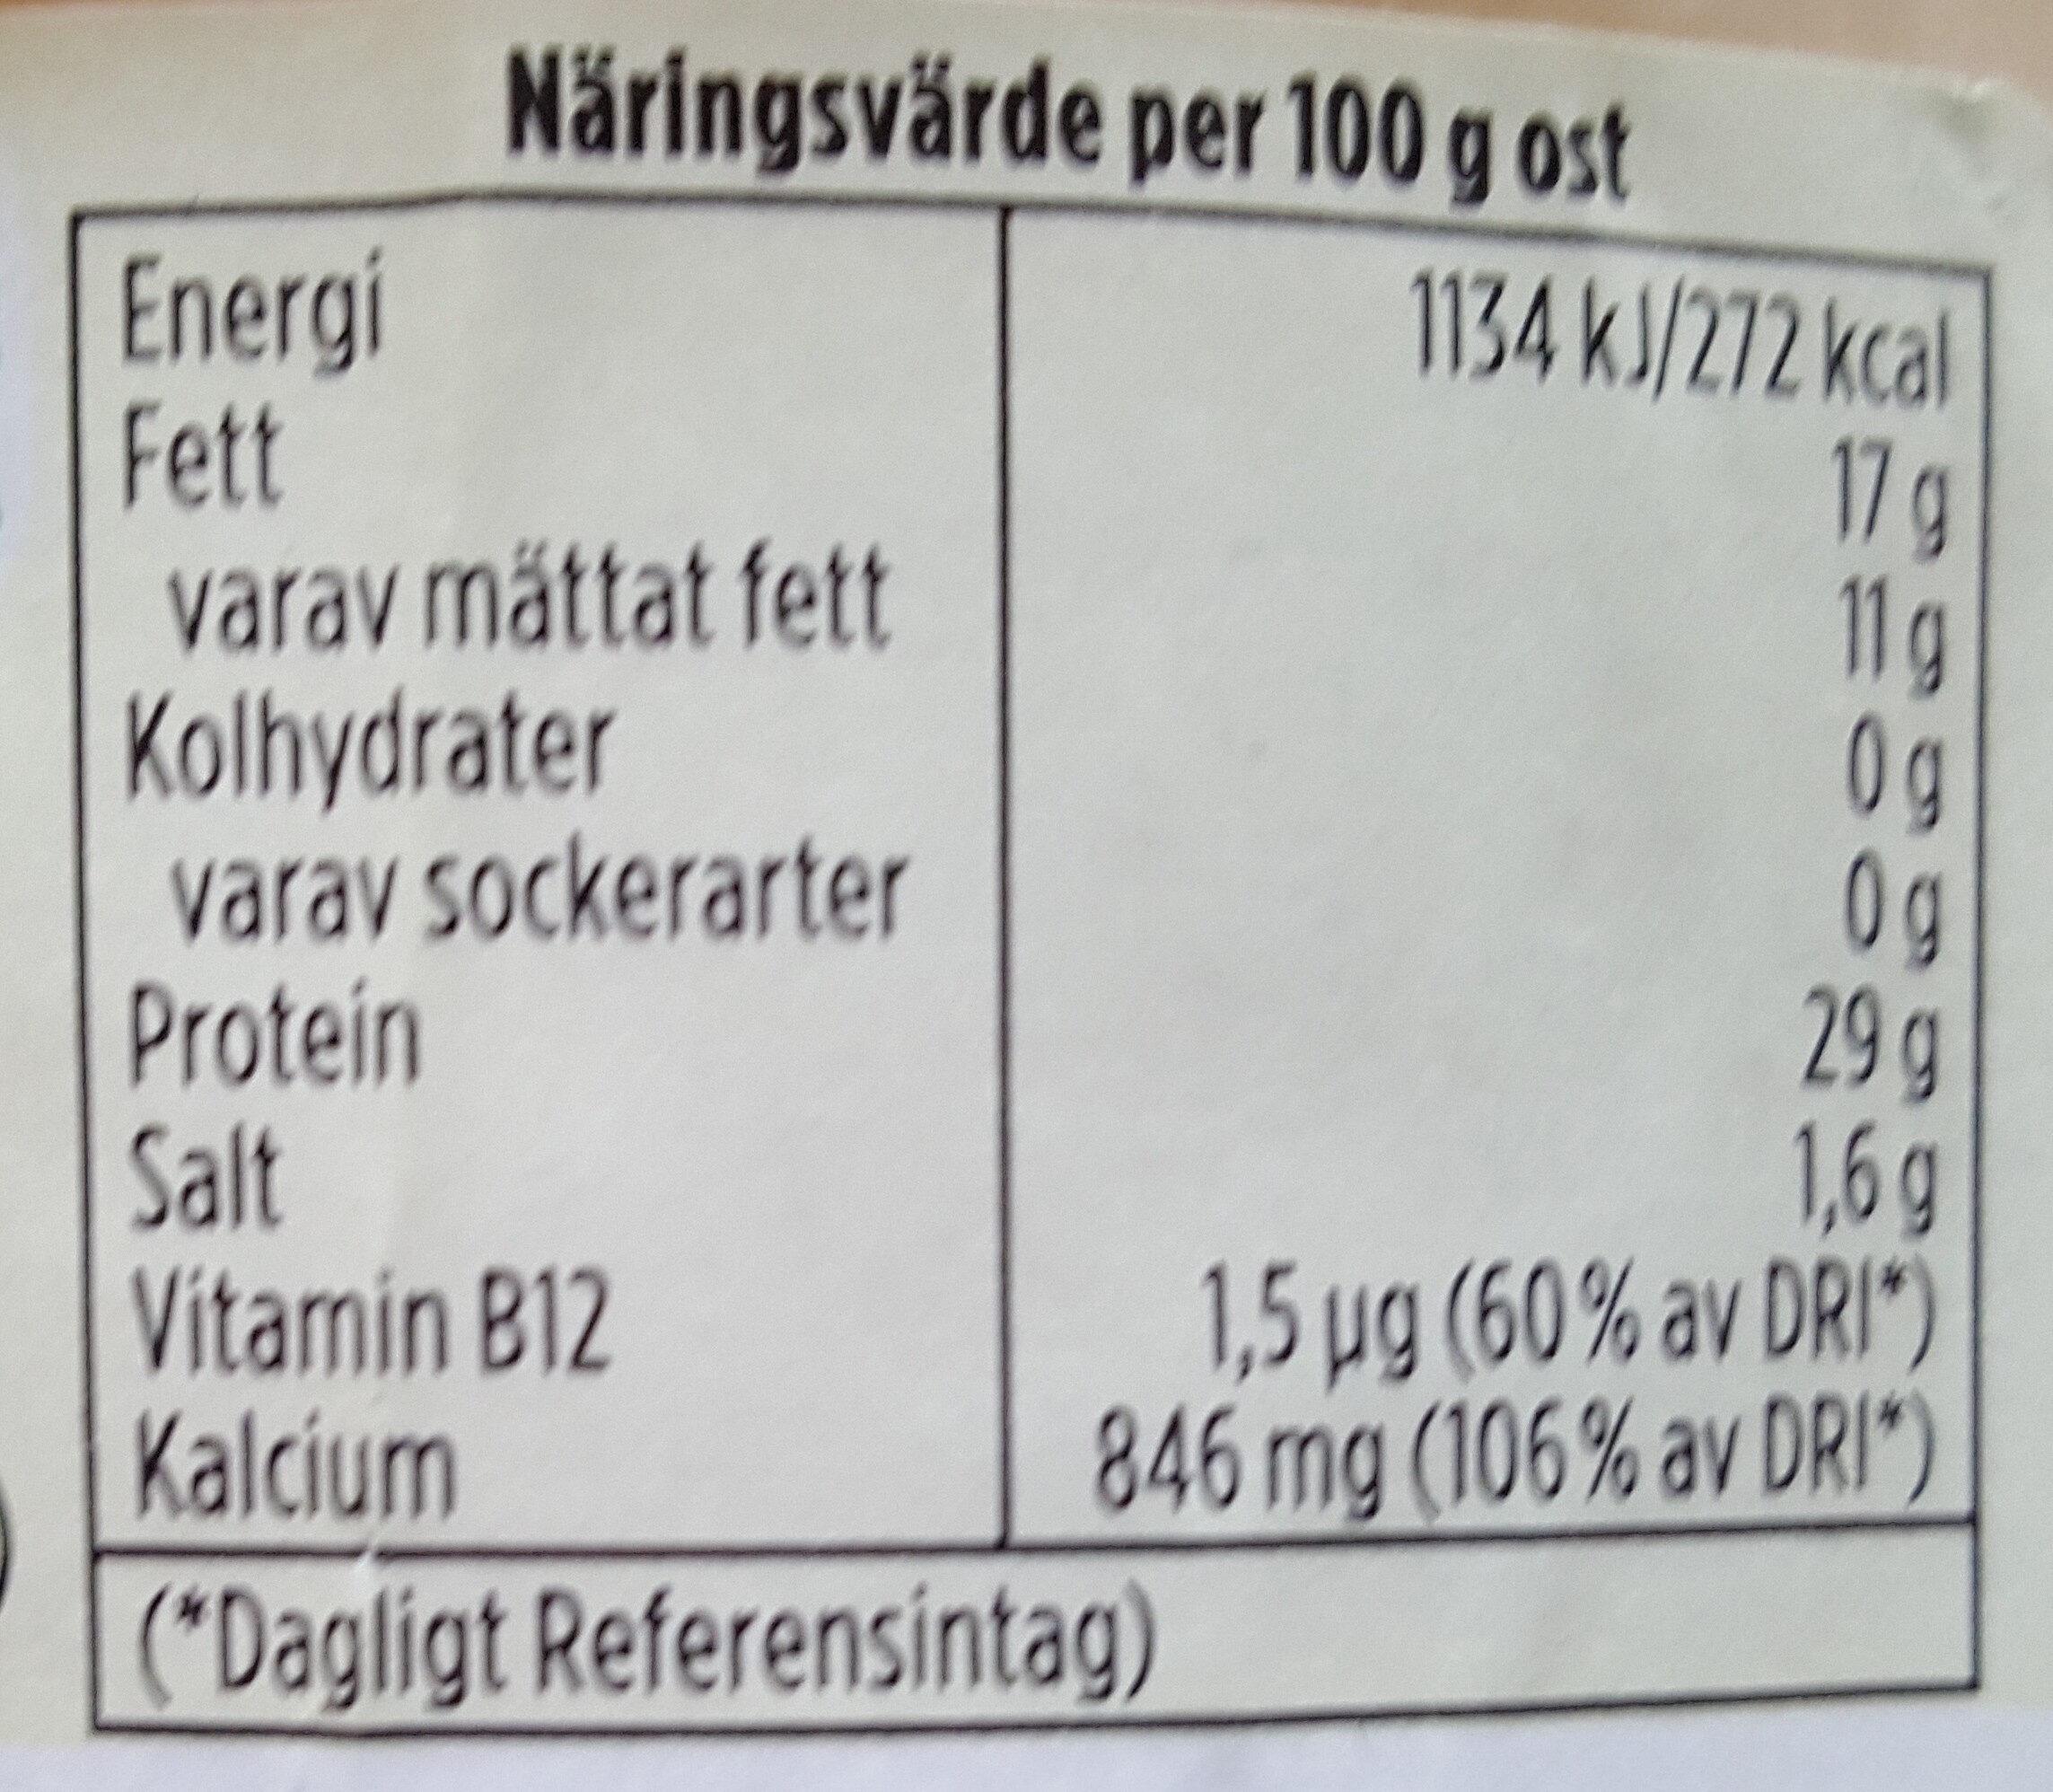 Hushållsost mild & len - Voedingswaarden - sv